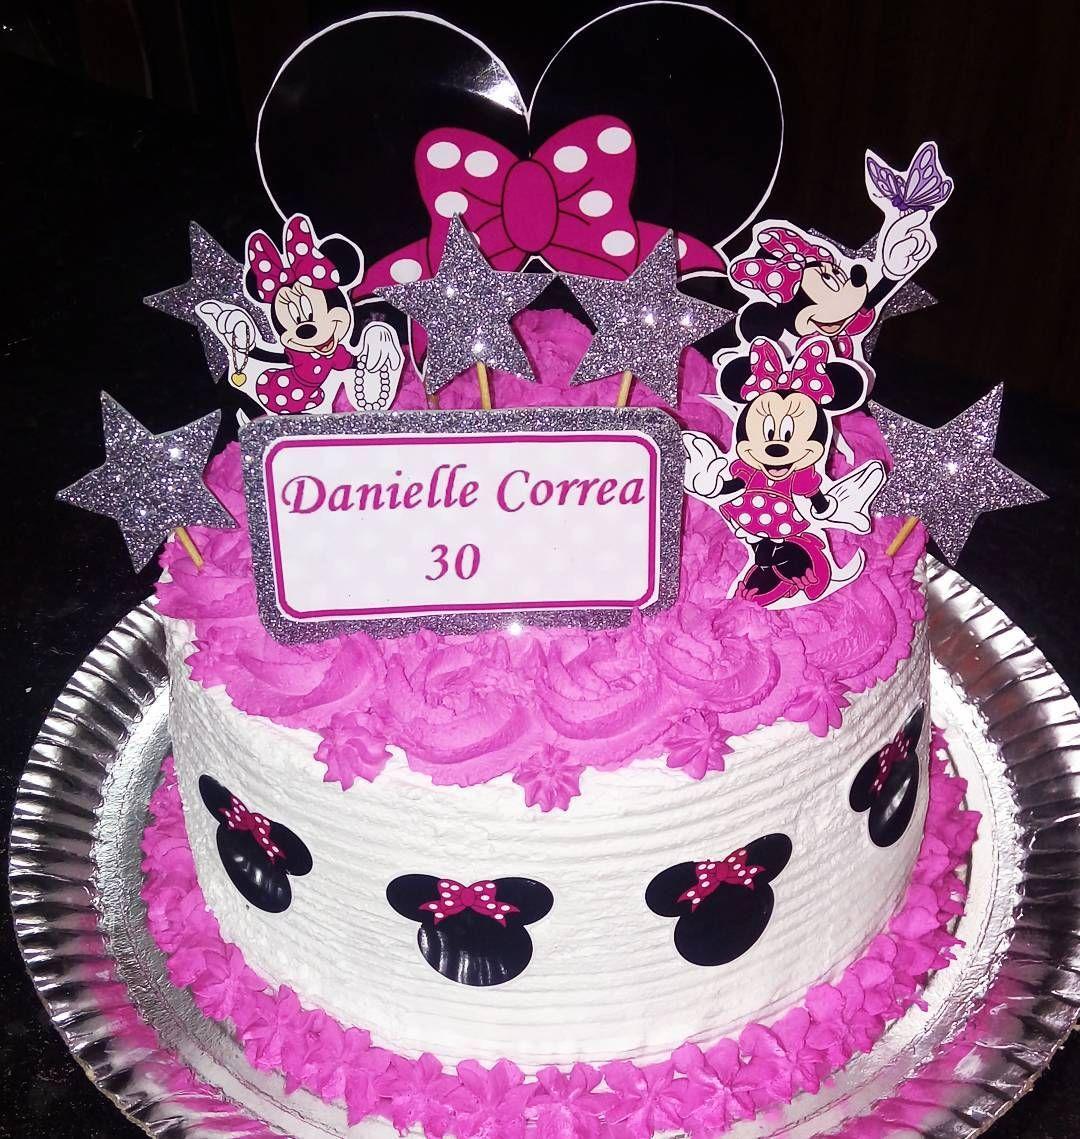 Torta da Minnie Rosa de morangos com chocolate  Peça ja a sua pelo whats 993595627  #torta #tortaartesanal #pie #love #cake #strawberry #strawberries #morangocomchocolate #morango #chocolate #chocolat #lechocolat #duchocolat #rosa #minnie #minniemouse #pink #folowme #follow #f4f #f #c #folow4folow #folowforfolow #segue #seguidores